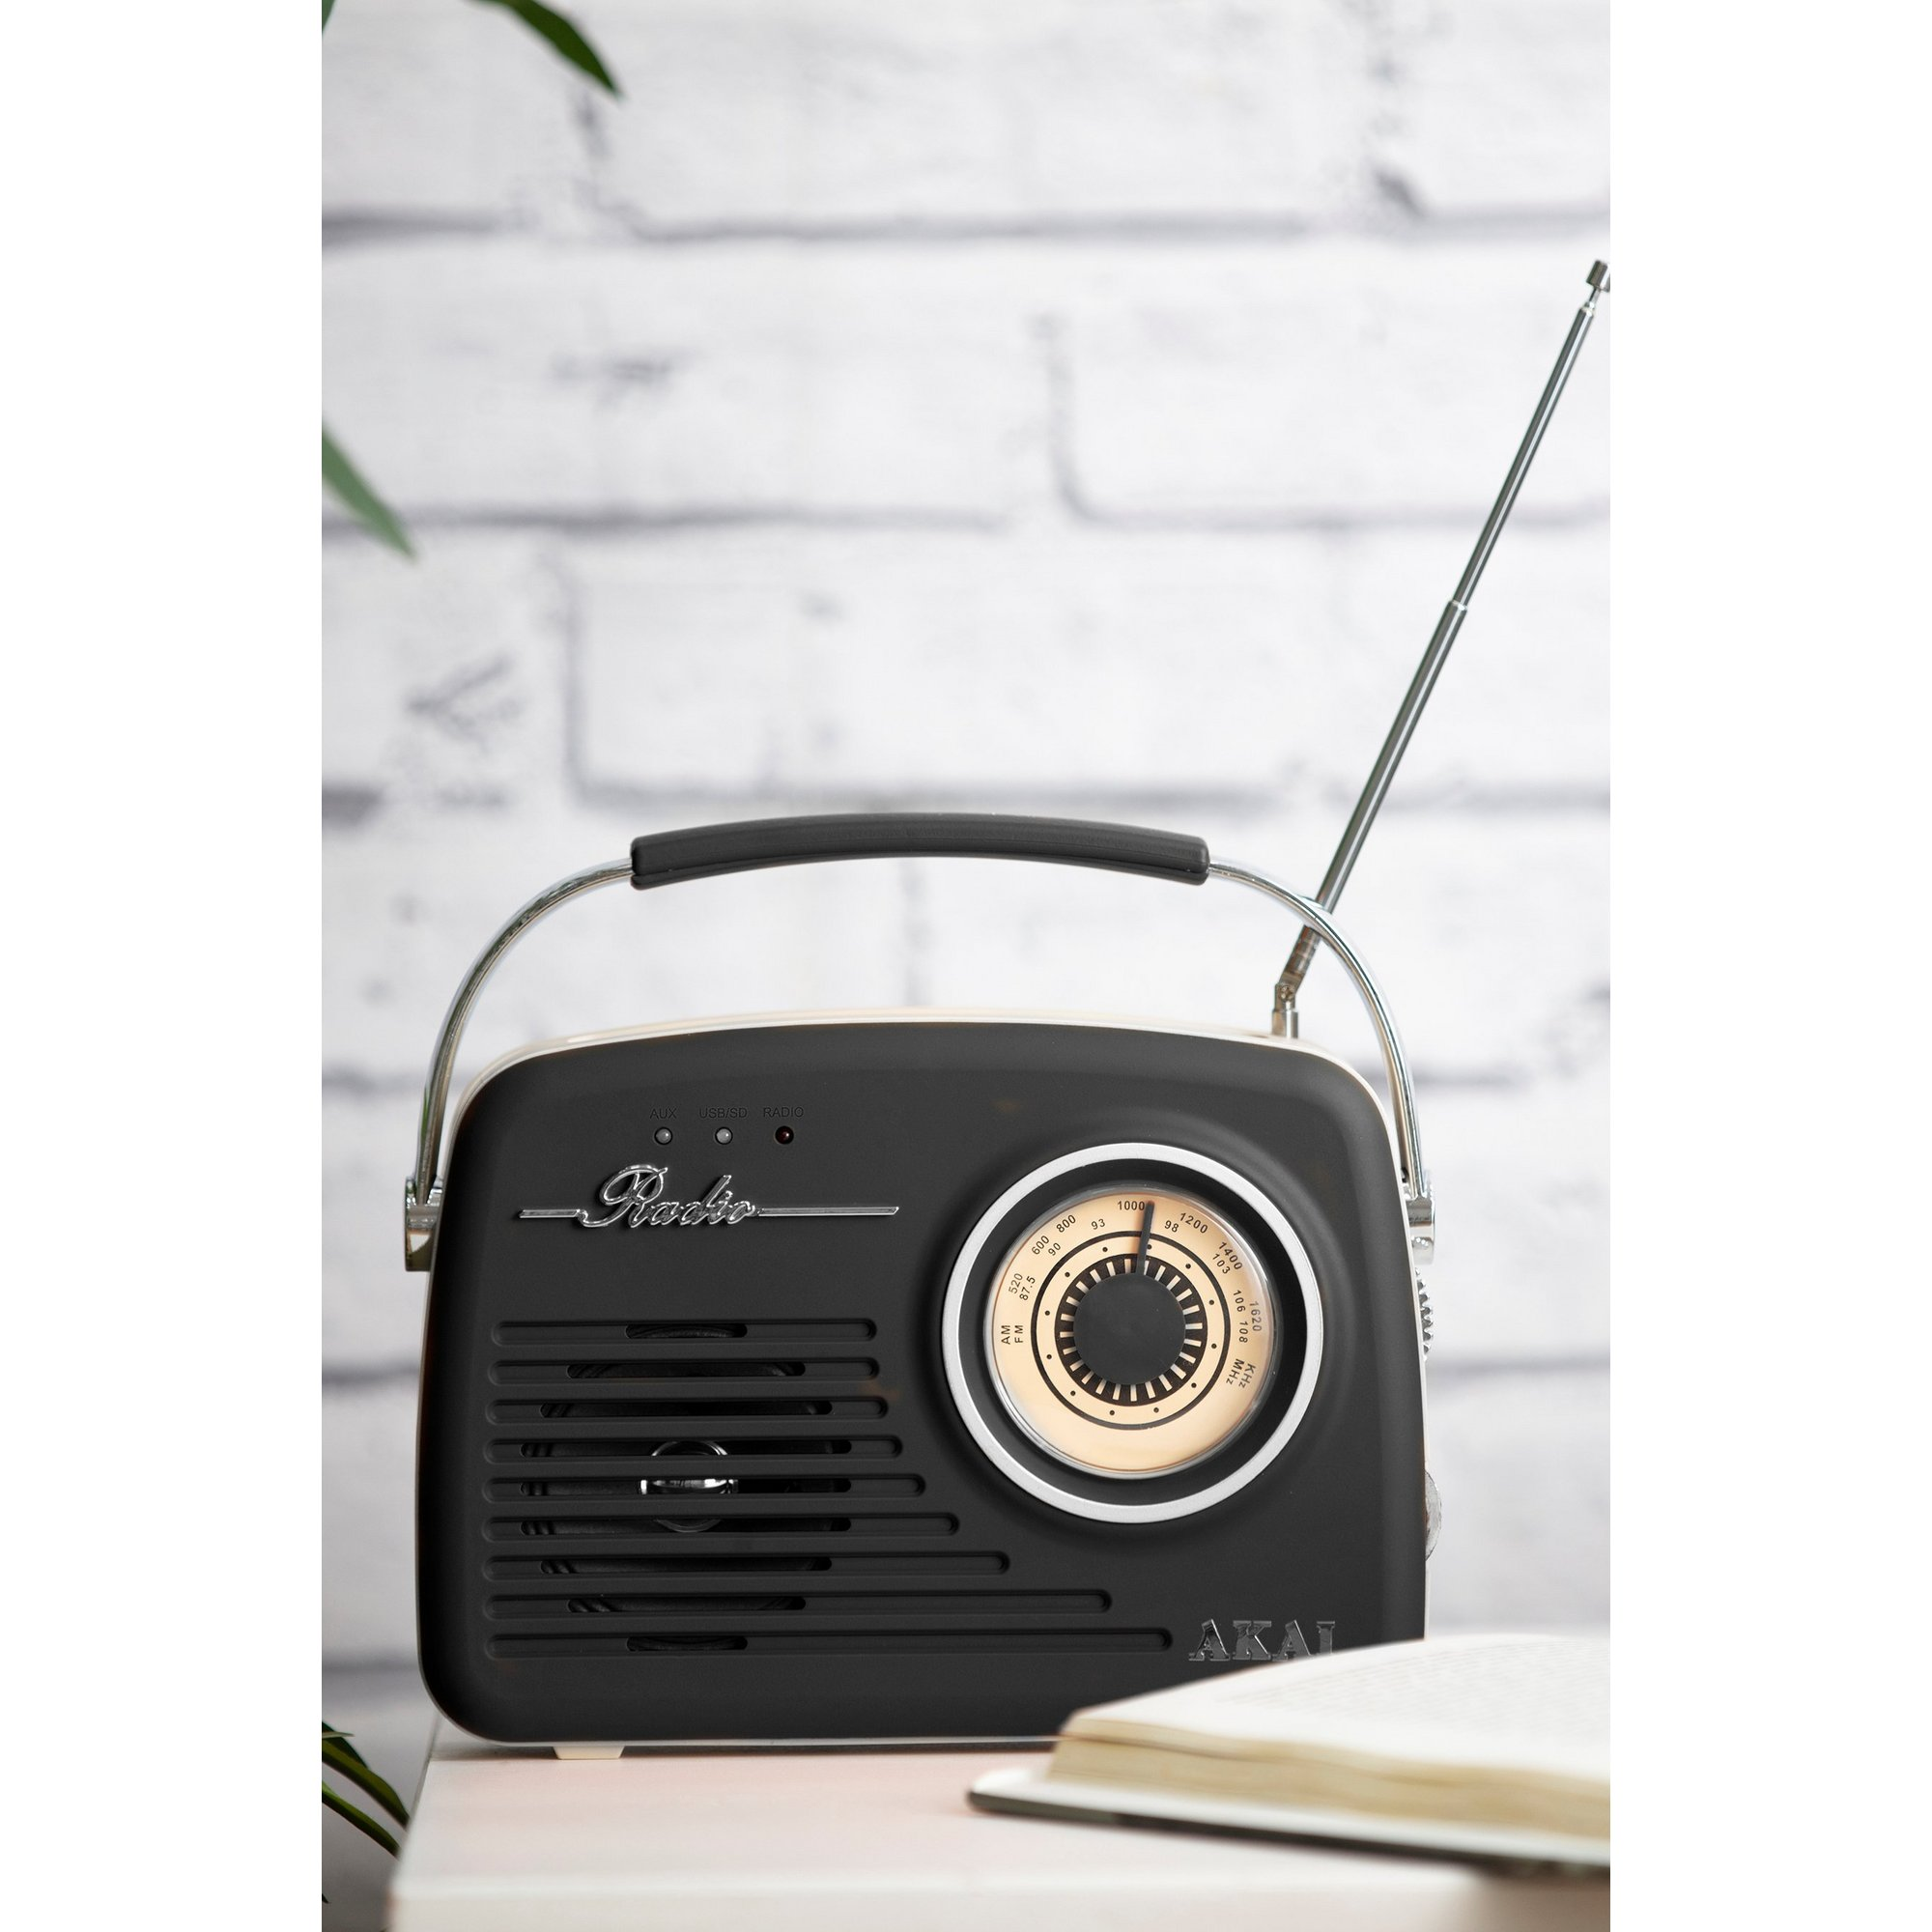 Image of AKAI FM/AM Radio